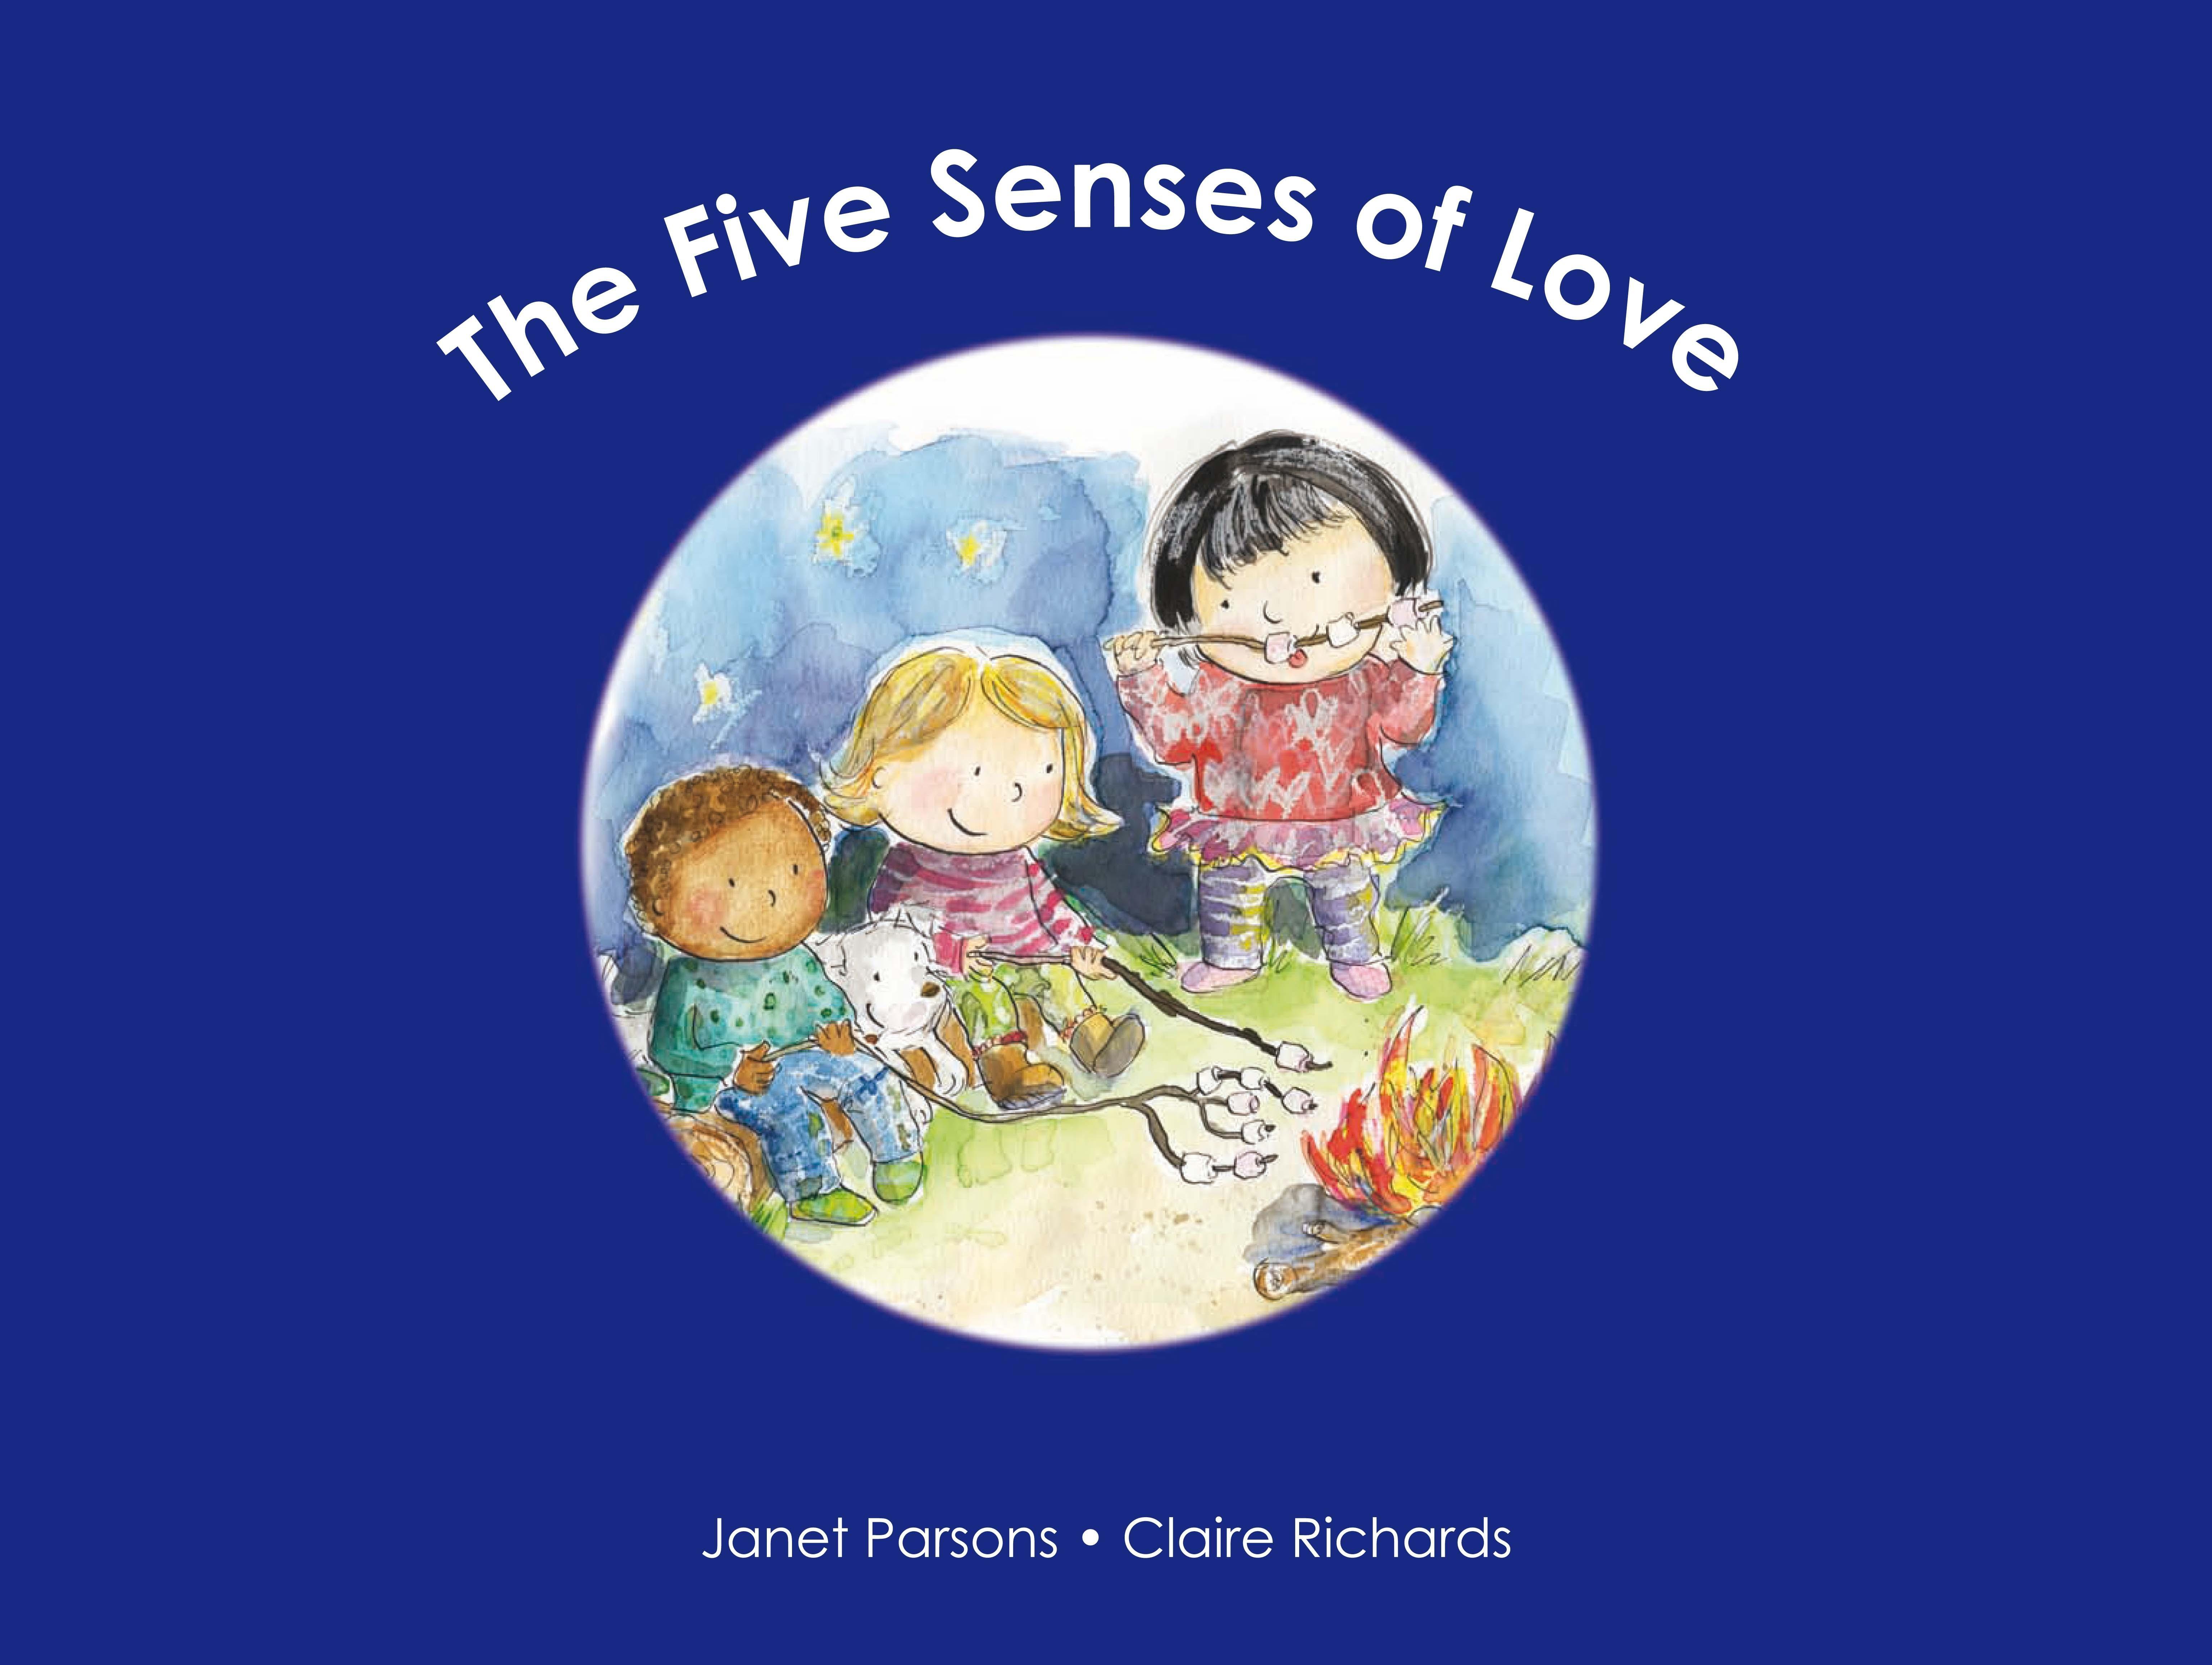 The Five SensesofLove